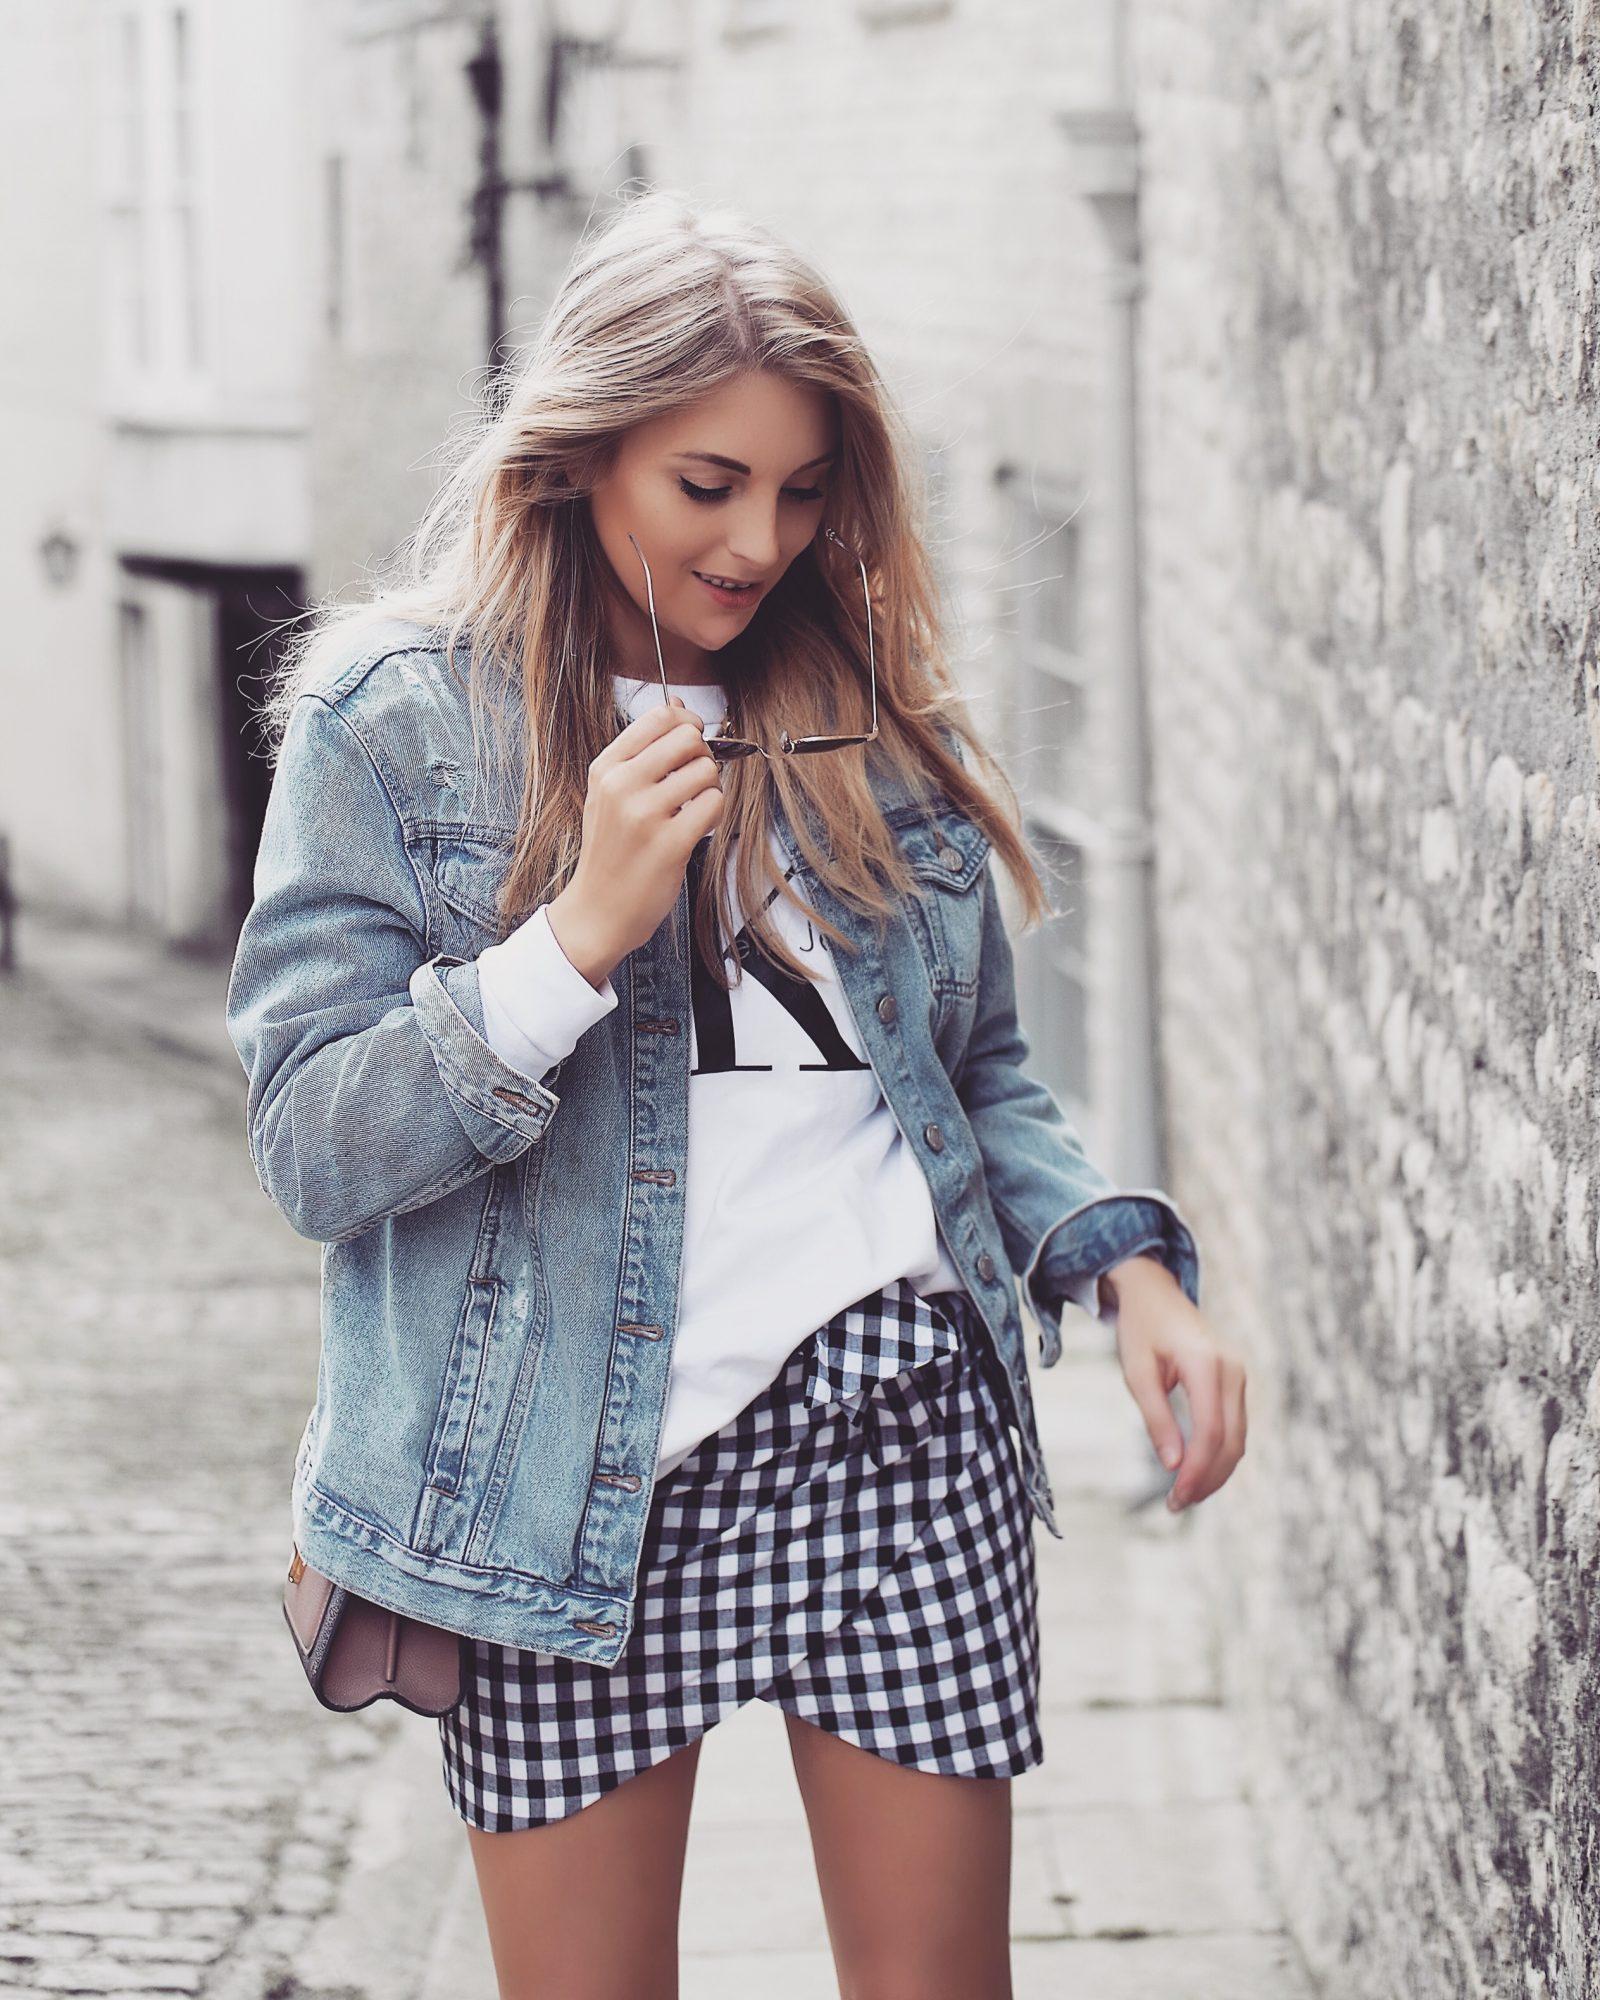 Gingham Skirt - Calvin Klein Sweatshirt